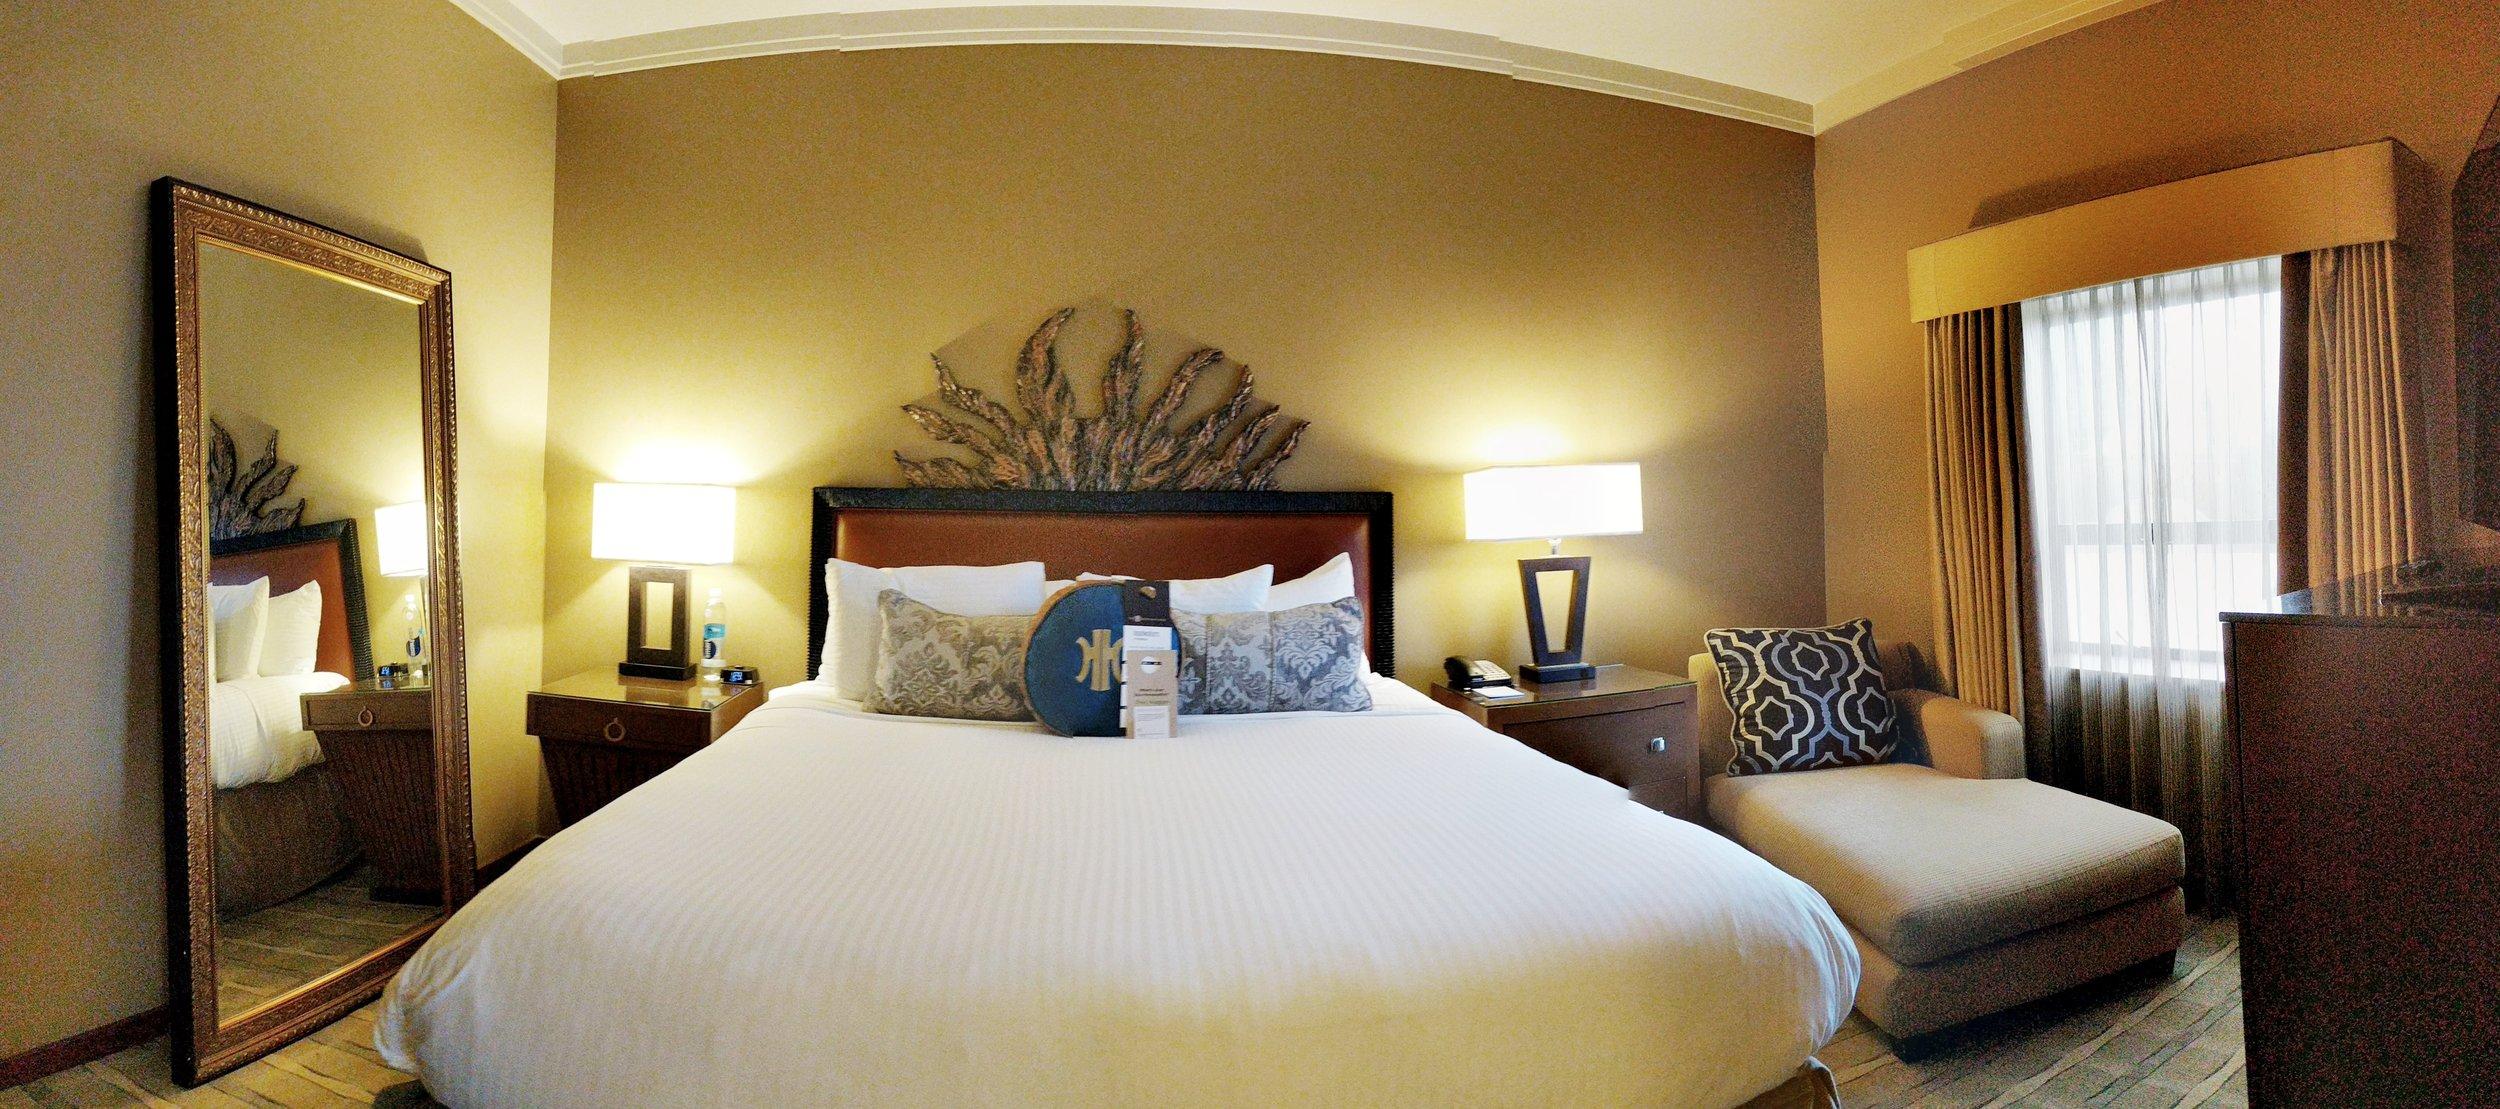 Heathman-hotel-bedroom.jpg